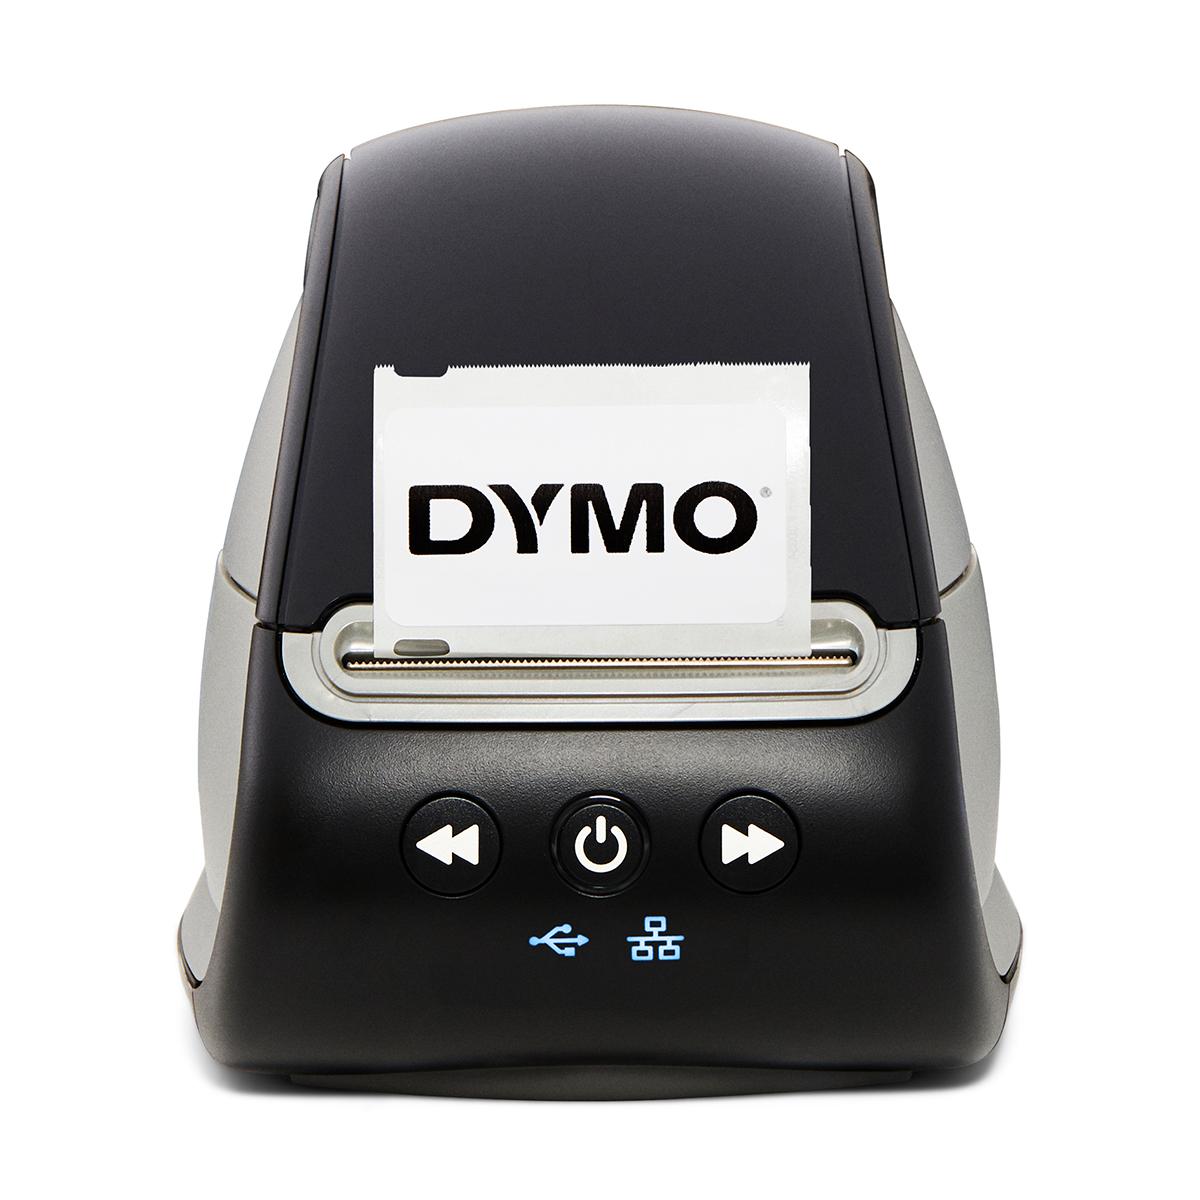 Dymo Labelwriter 550 Turbo Desktop Label Printer